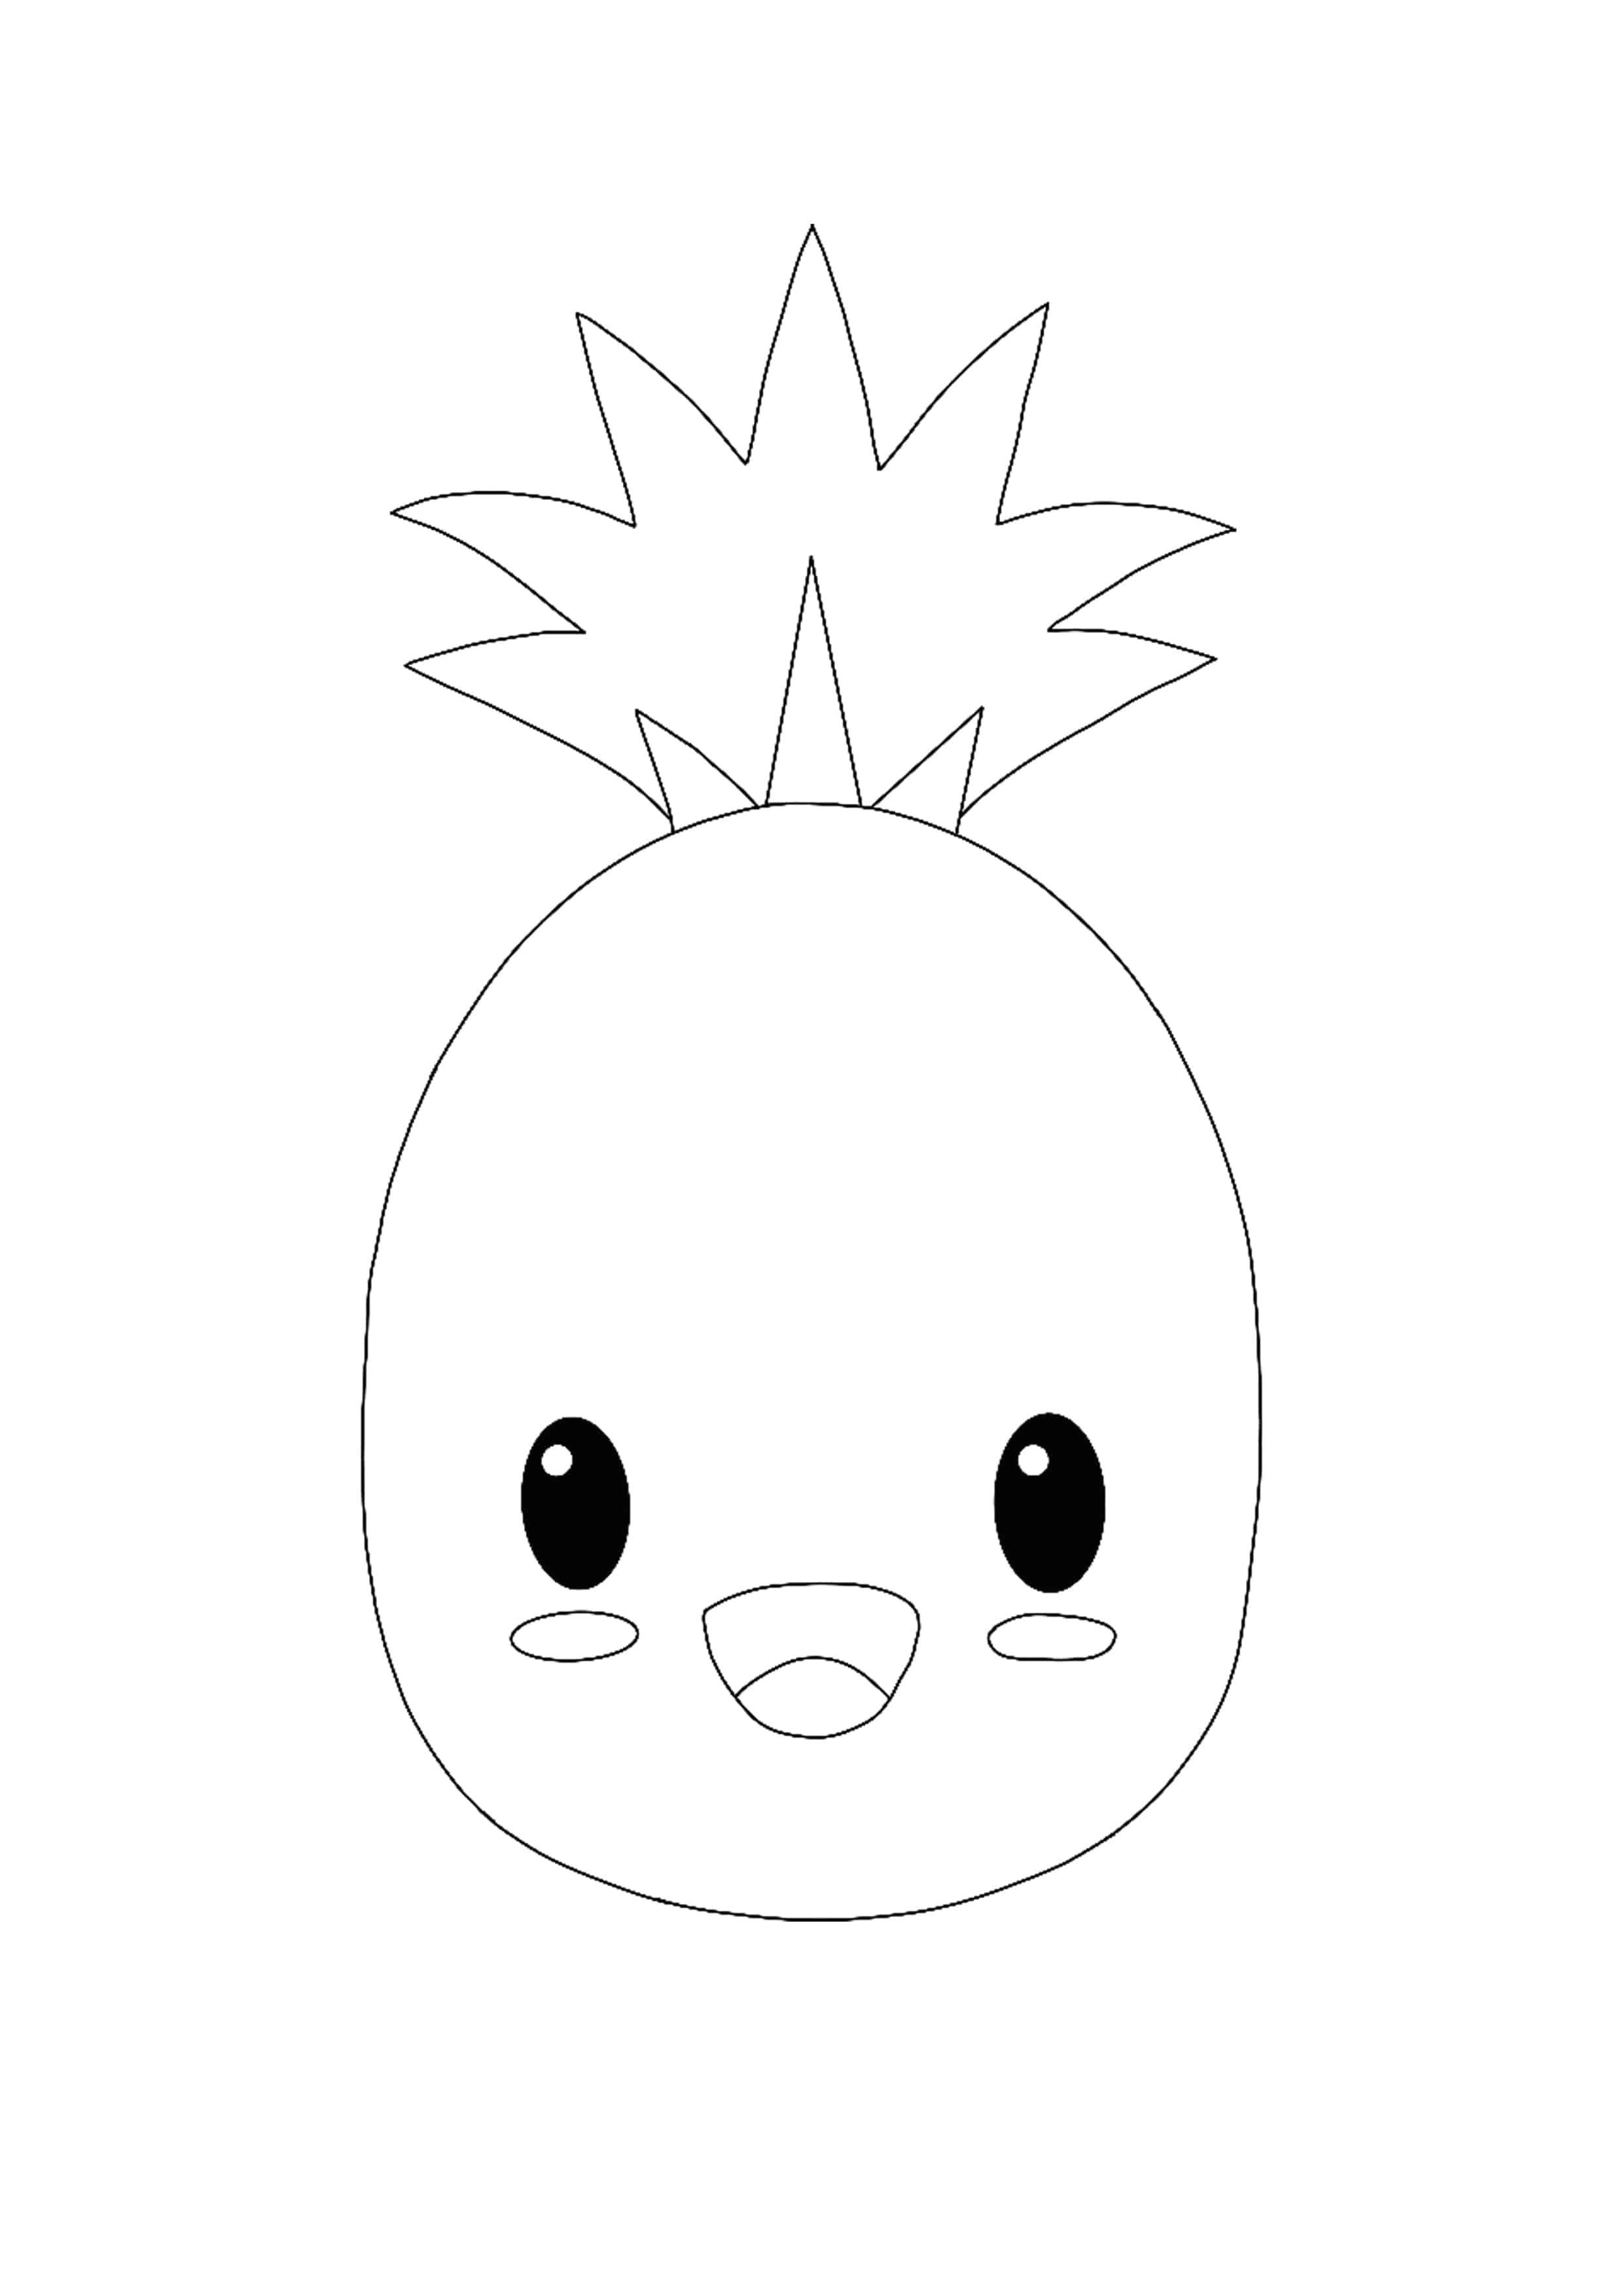 Easy Kawaii Pineapple Coloring Page In 2020 Kawaii Pineapple Coloring Pages Free Printable Coloring Pages